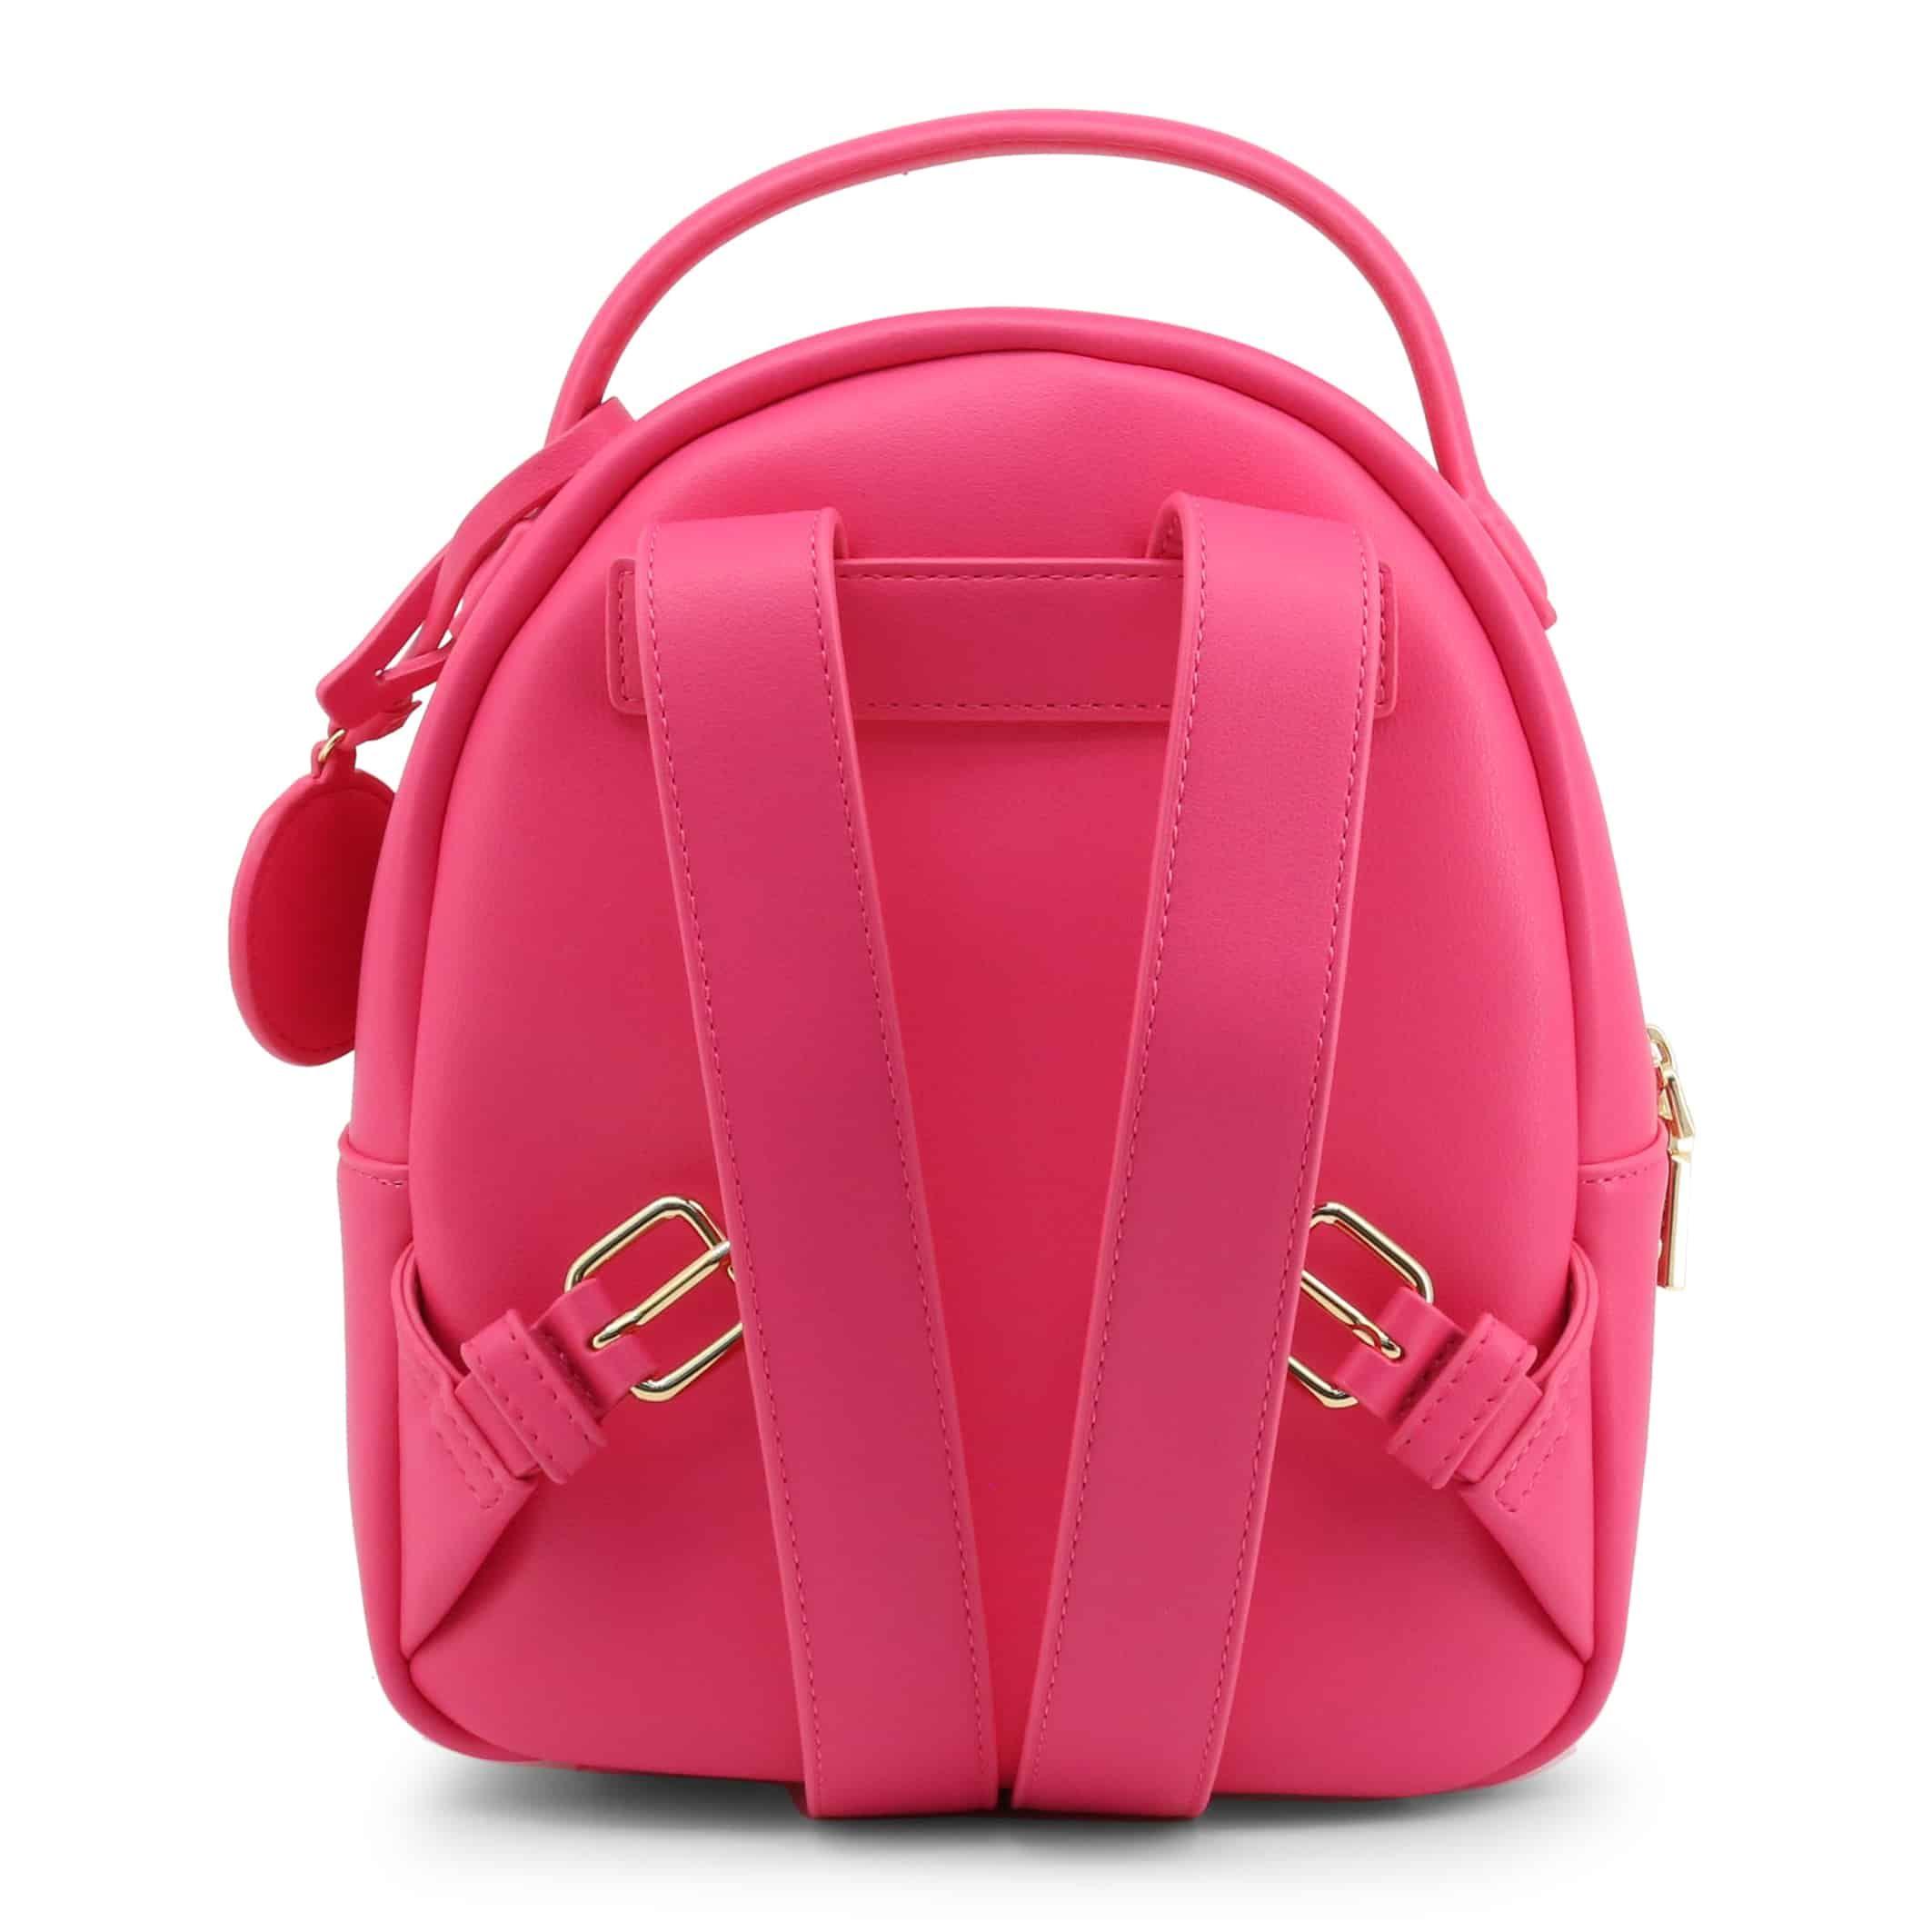 aa510e00 8b2d 11eb abbe 756064413543 Love Moschino - JC4101PP1CLJ0 - Pink